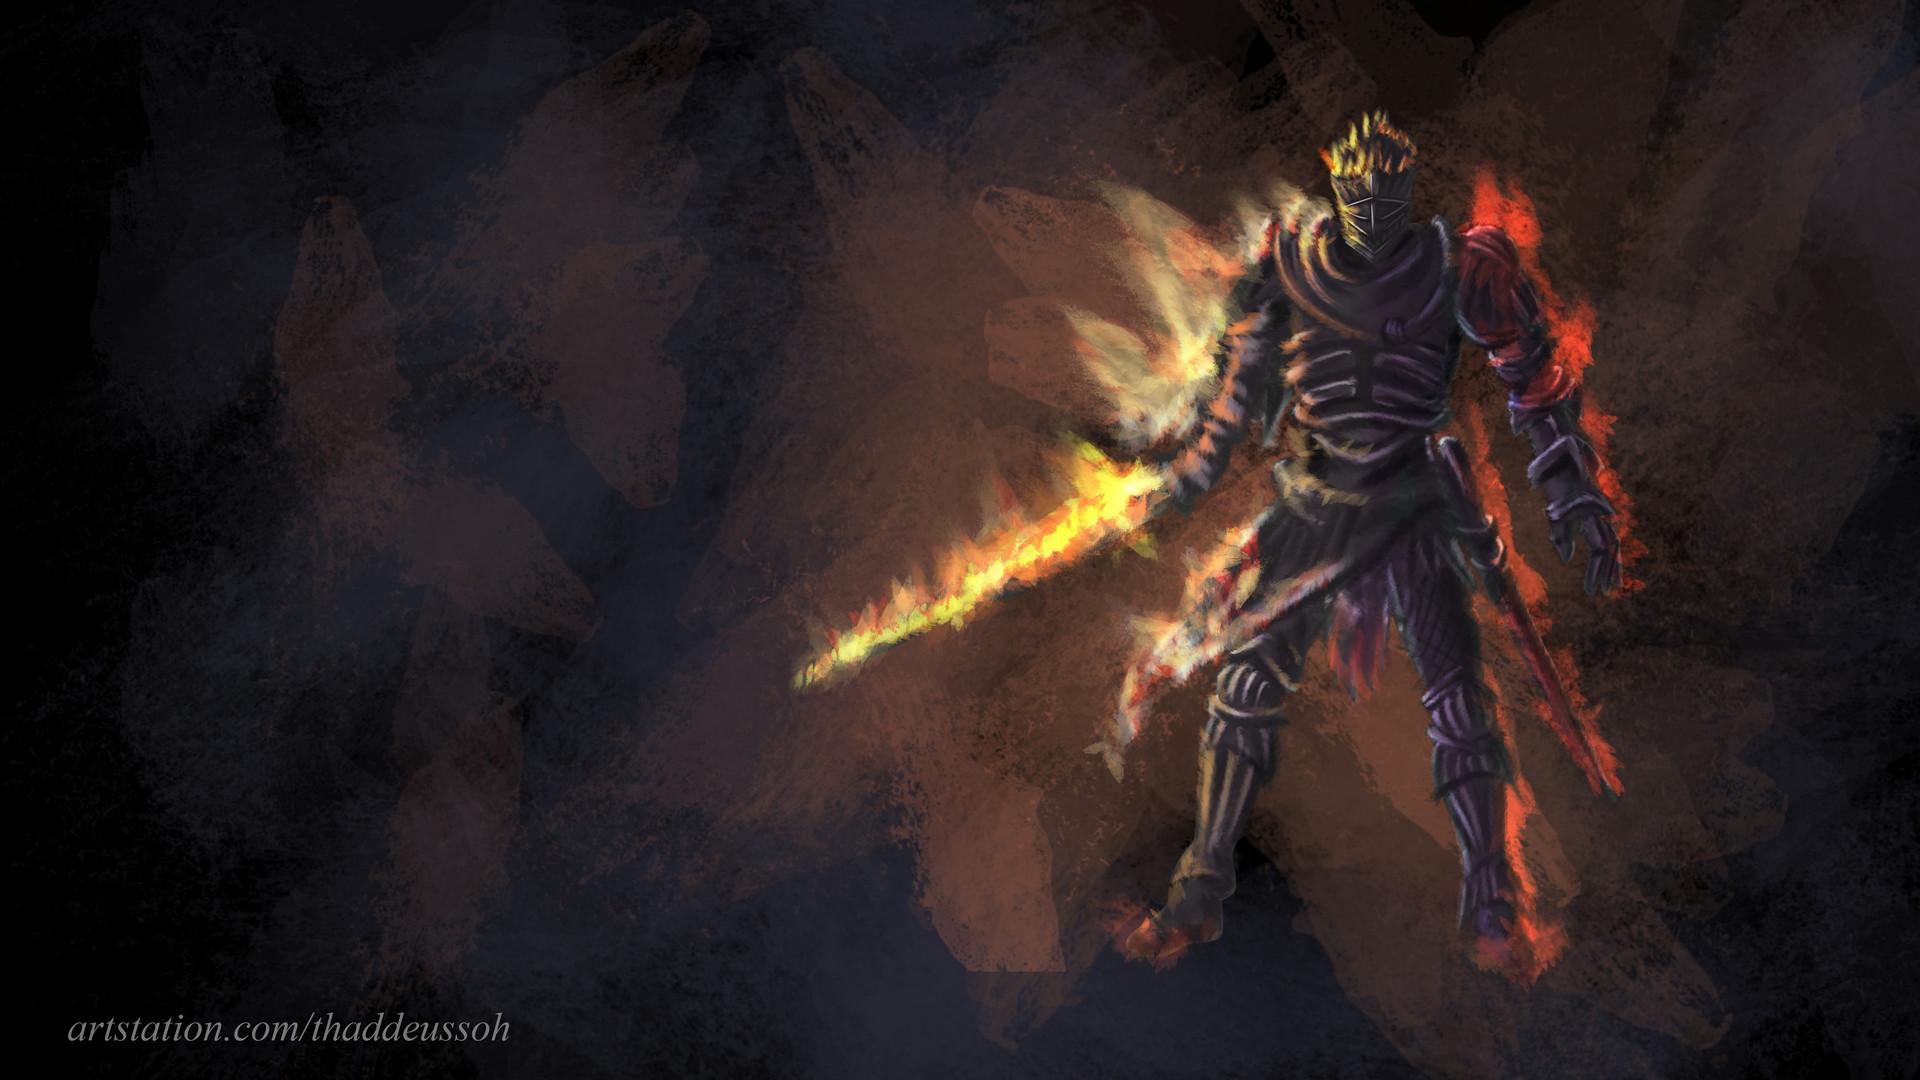 Artstation Dark Souls 3 Fanart Soul Of Cinder Thaddeus Soh